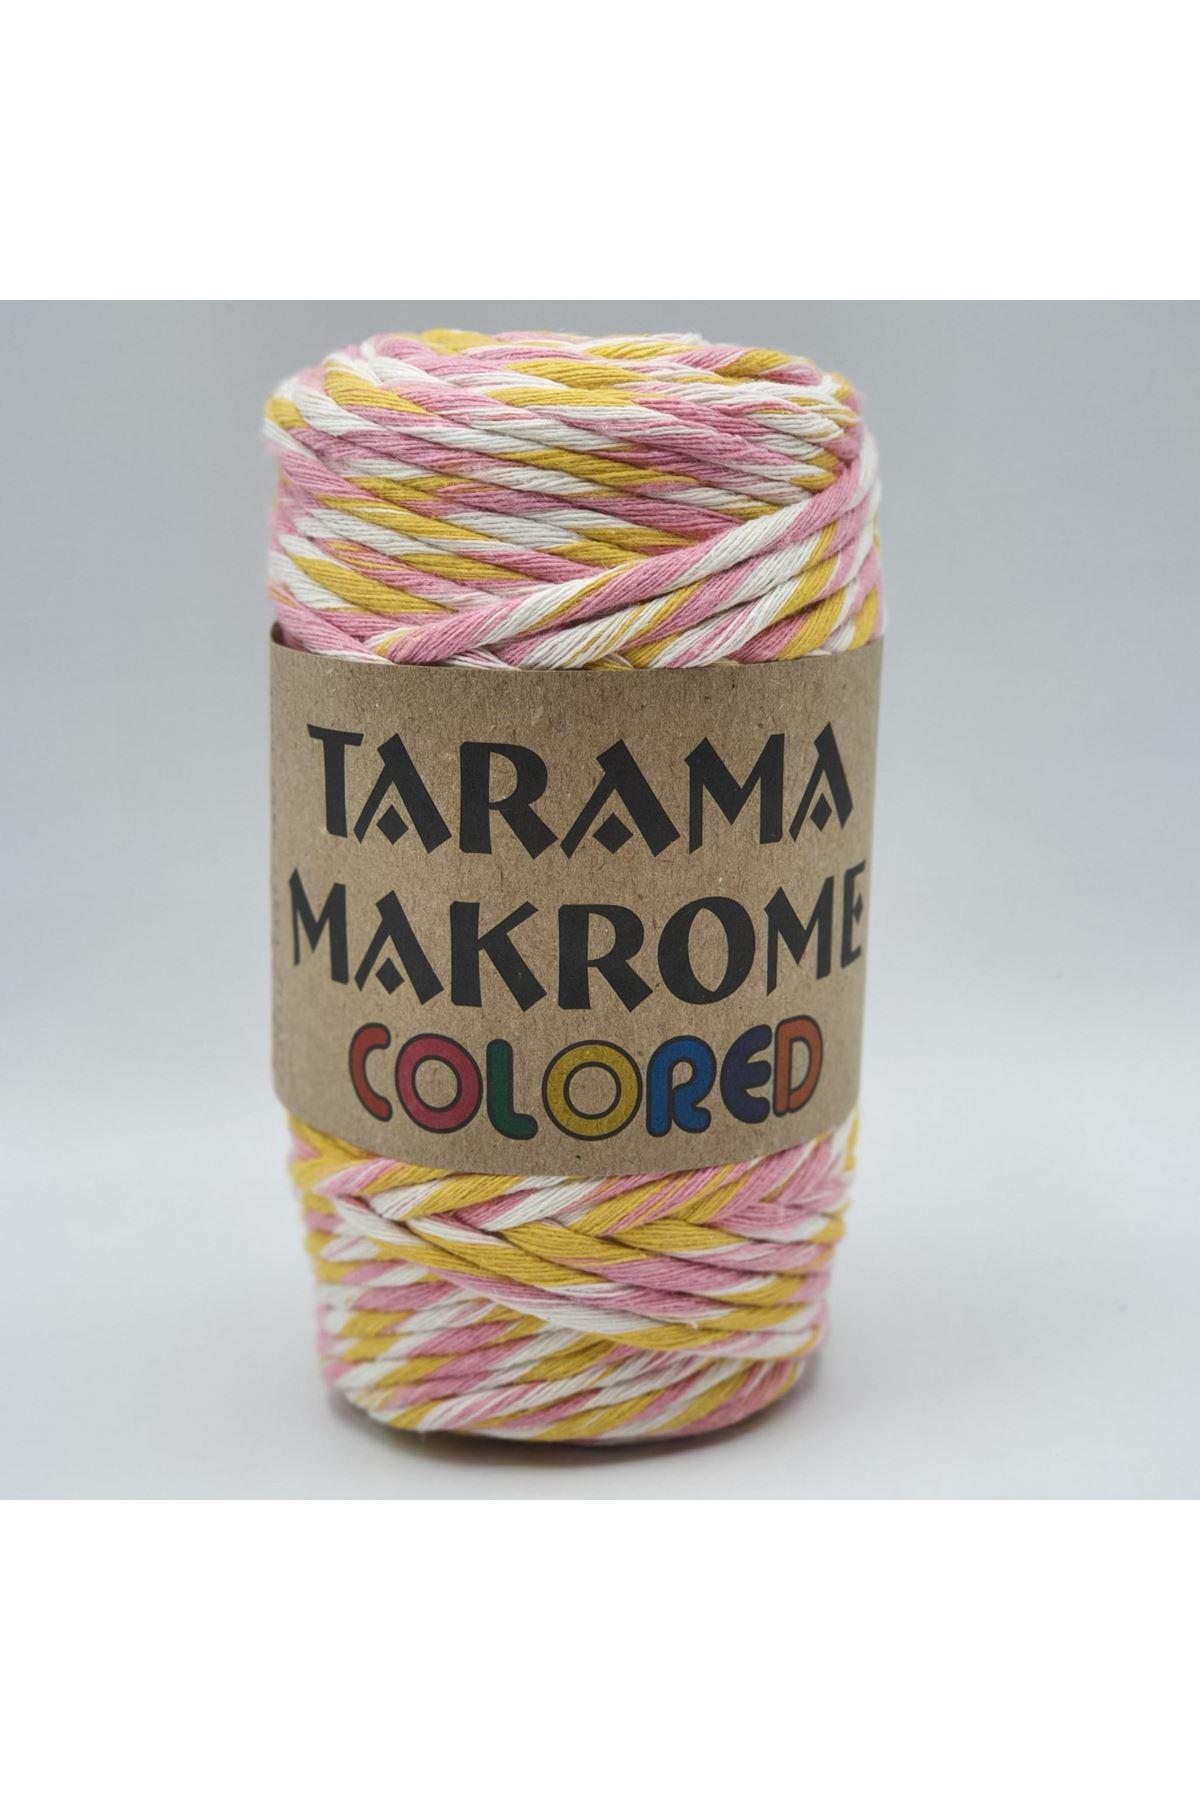 Tarama Makrome Colored 5 mm - 11